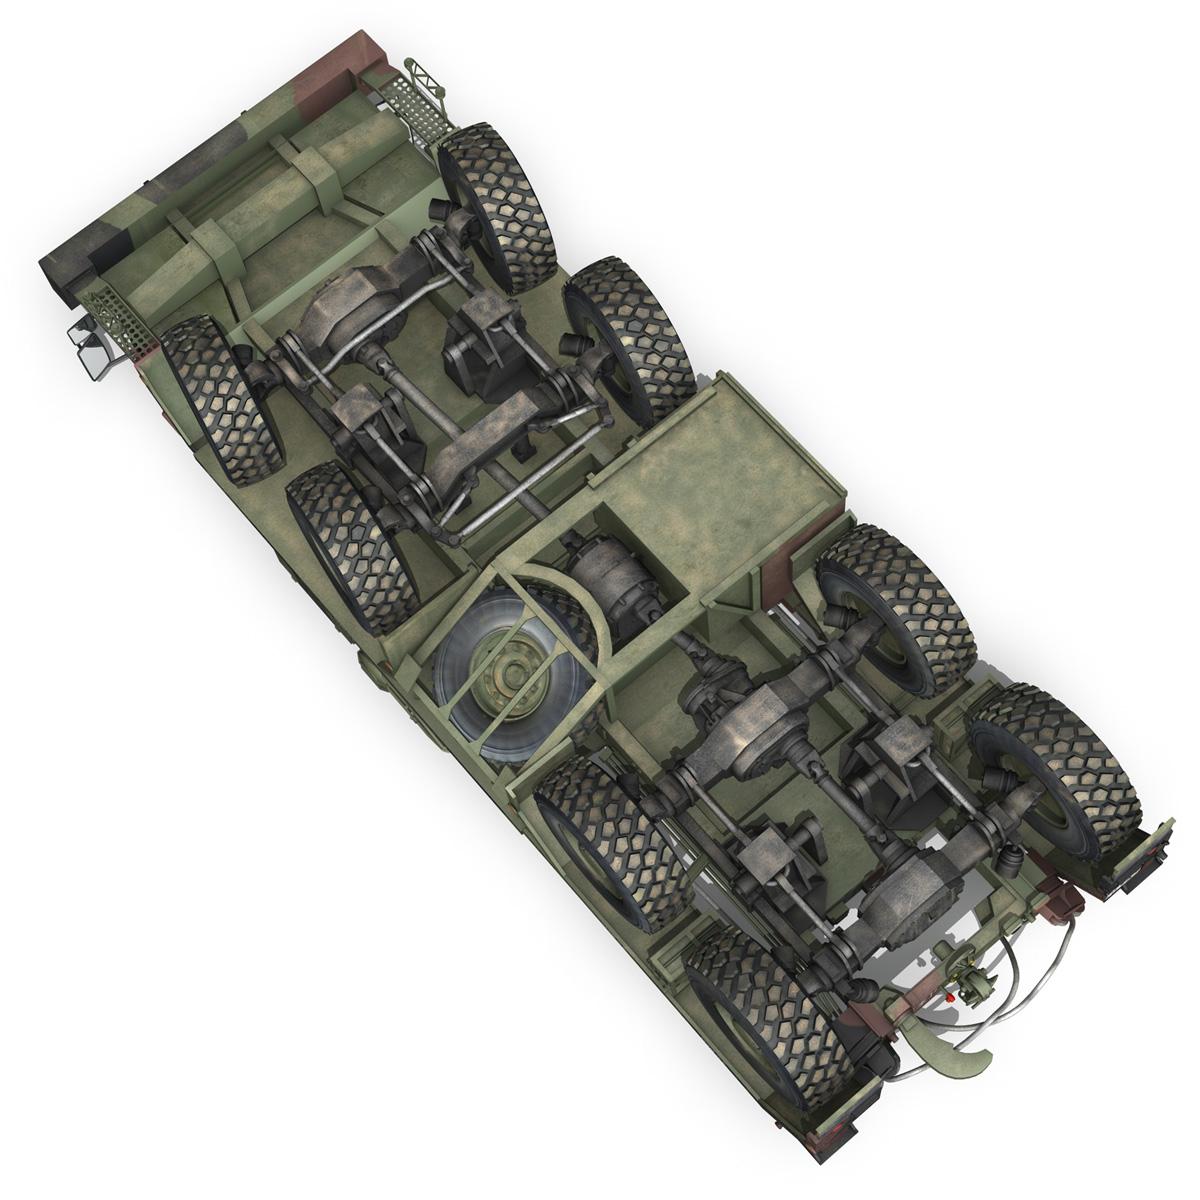 faun stl-56 transportues tank 3d model 3ds fbx c4d lwo obj 201917